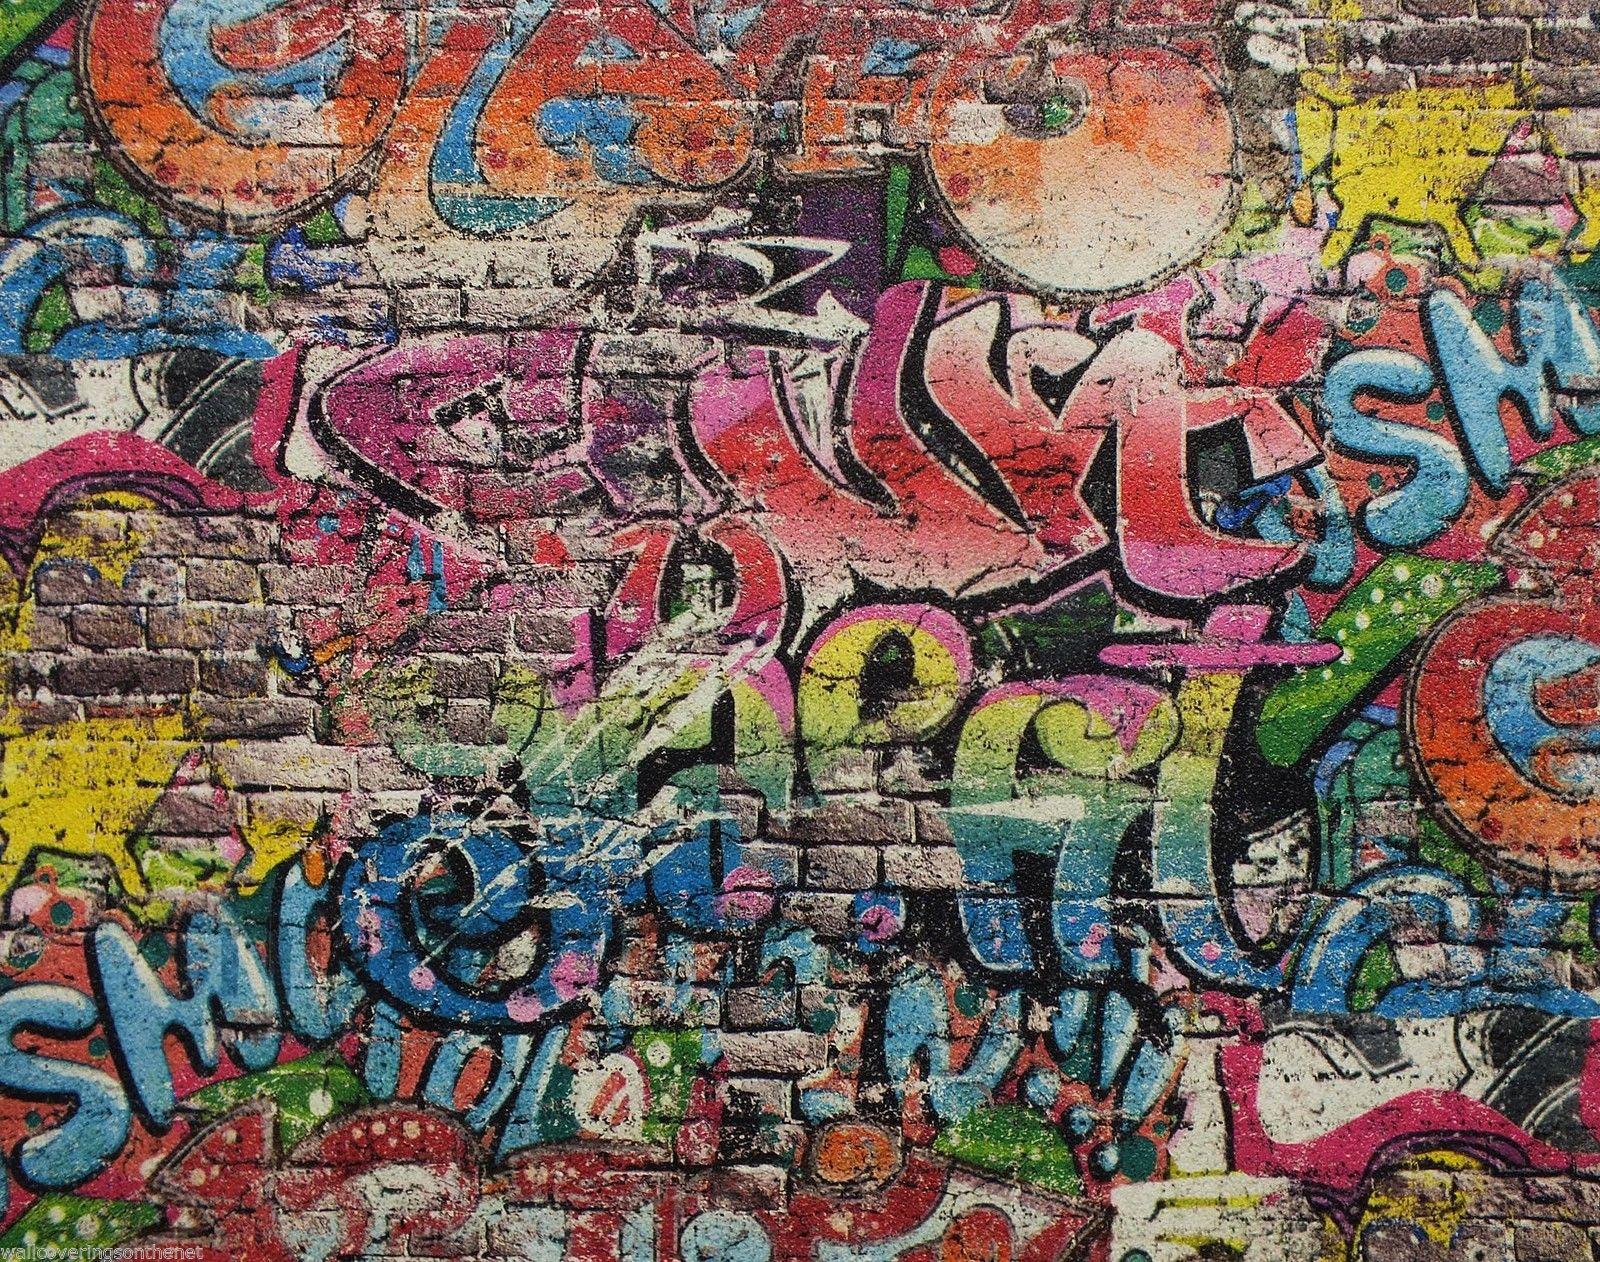 P Amp S Graffiti Street Art Children Kids Teenager Tag Brick